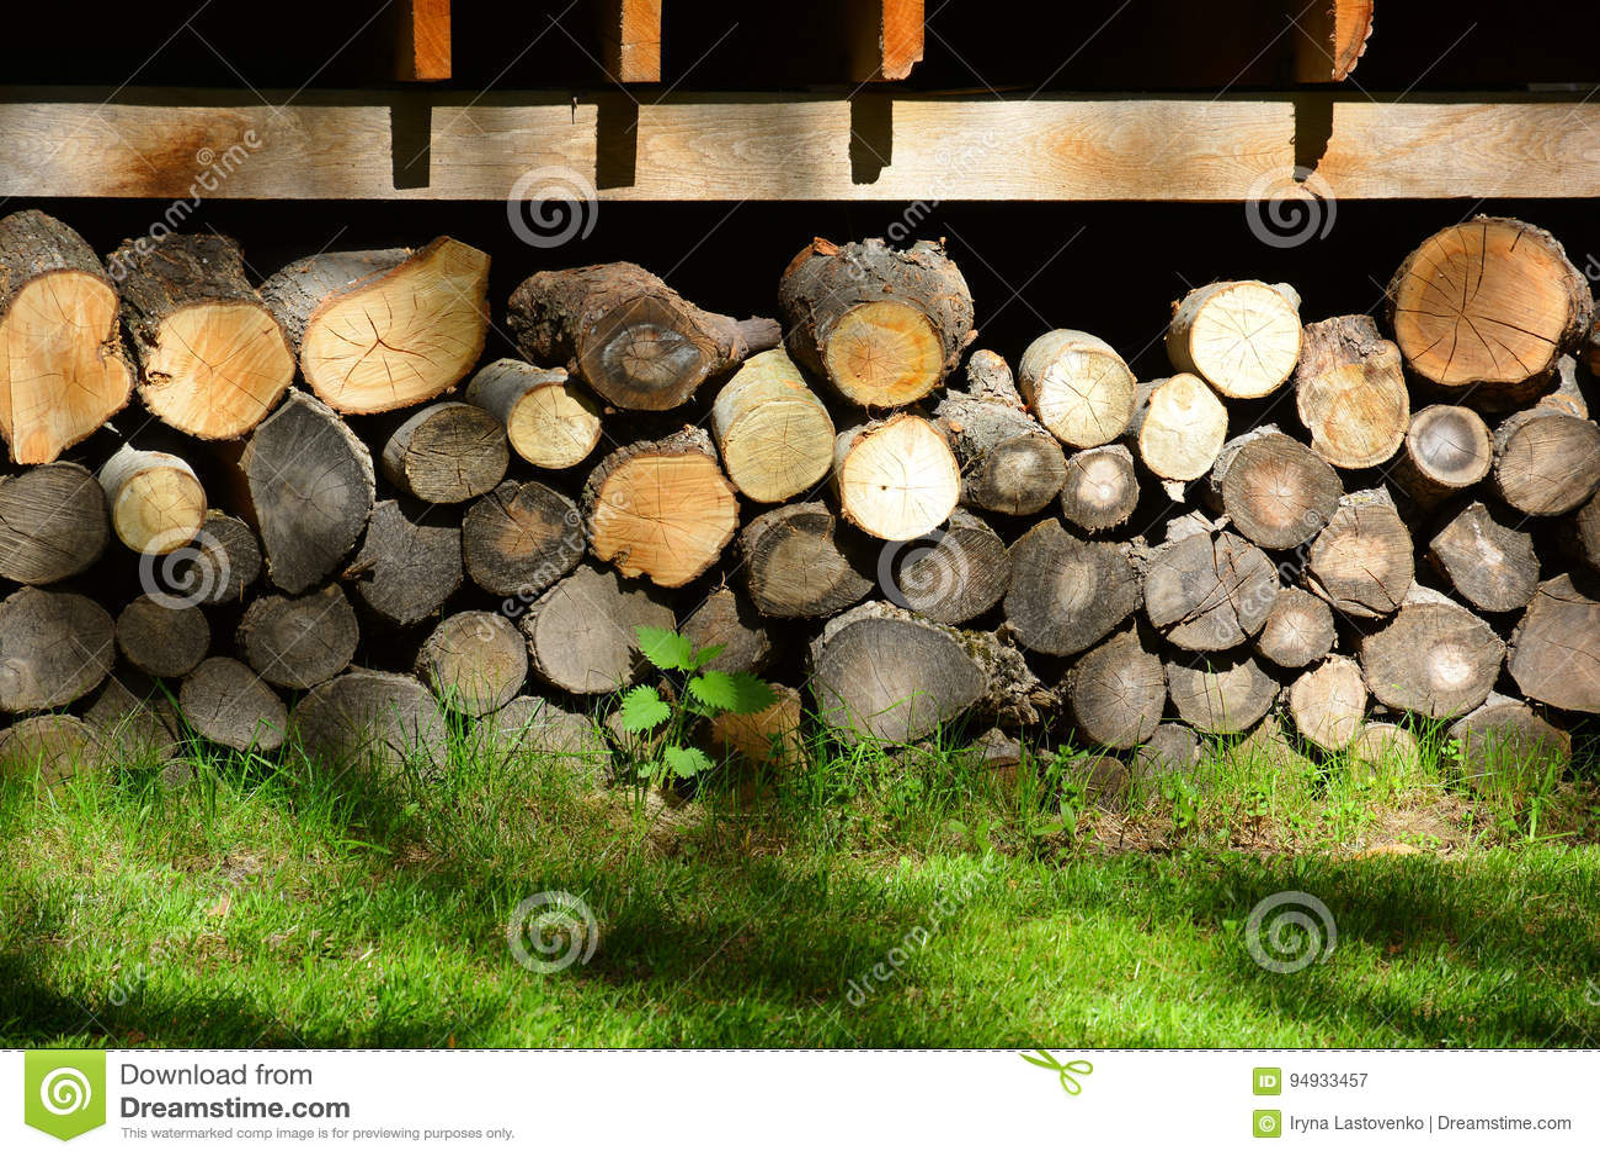 Firewood Stockez le bois de chauffage